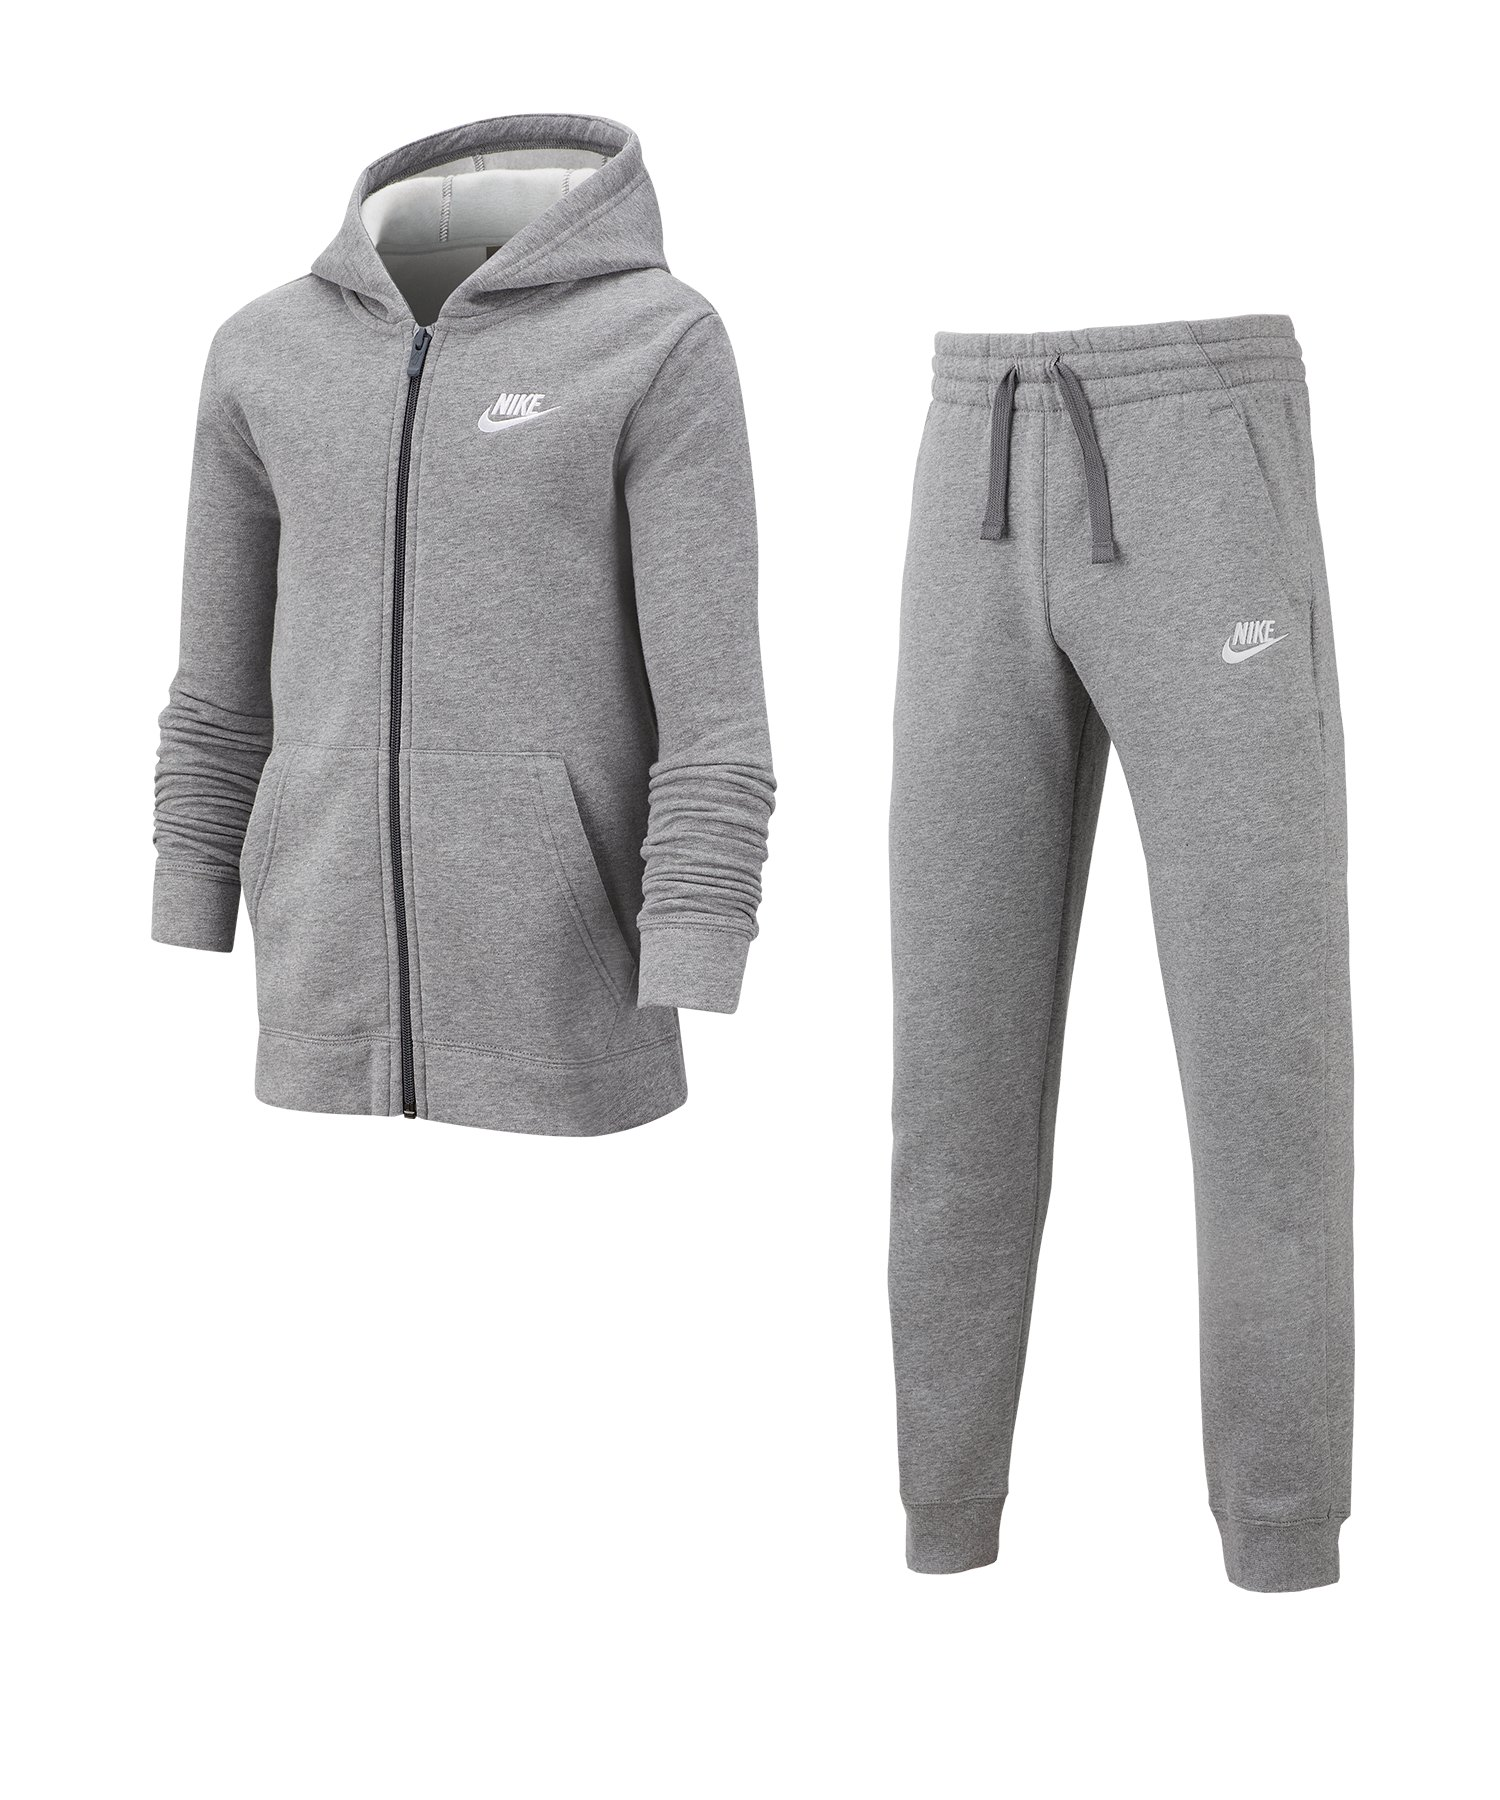 Nike Tracksuit Trainingsanzug Kids Grau F091 - grau